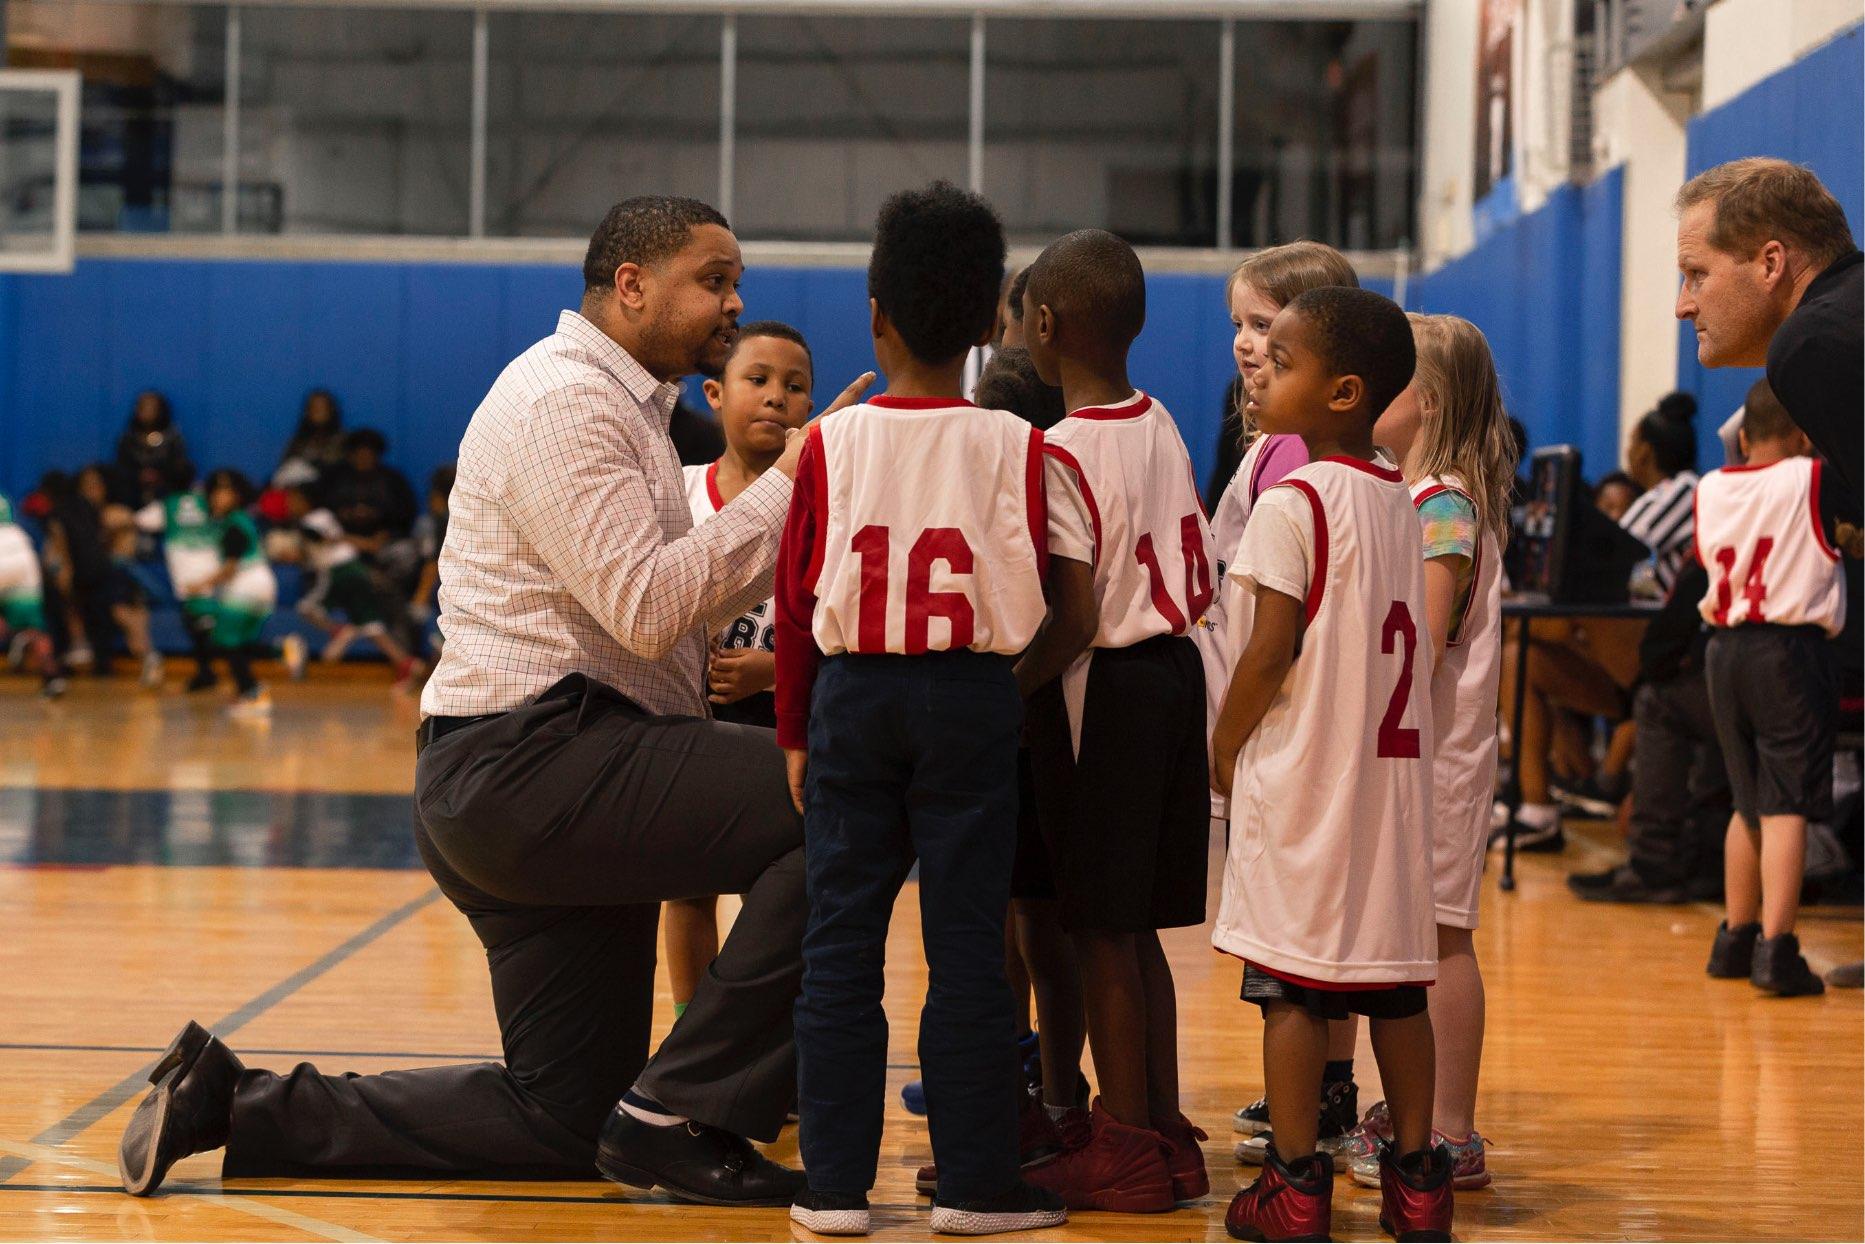 Volunteer Coach at Boys and Girls Club Kansas City